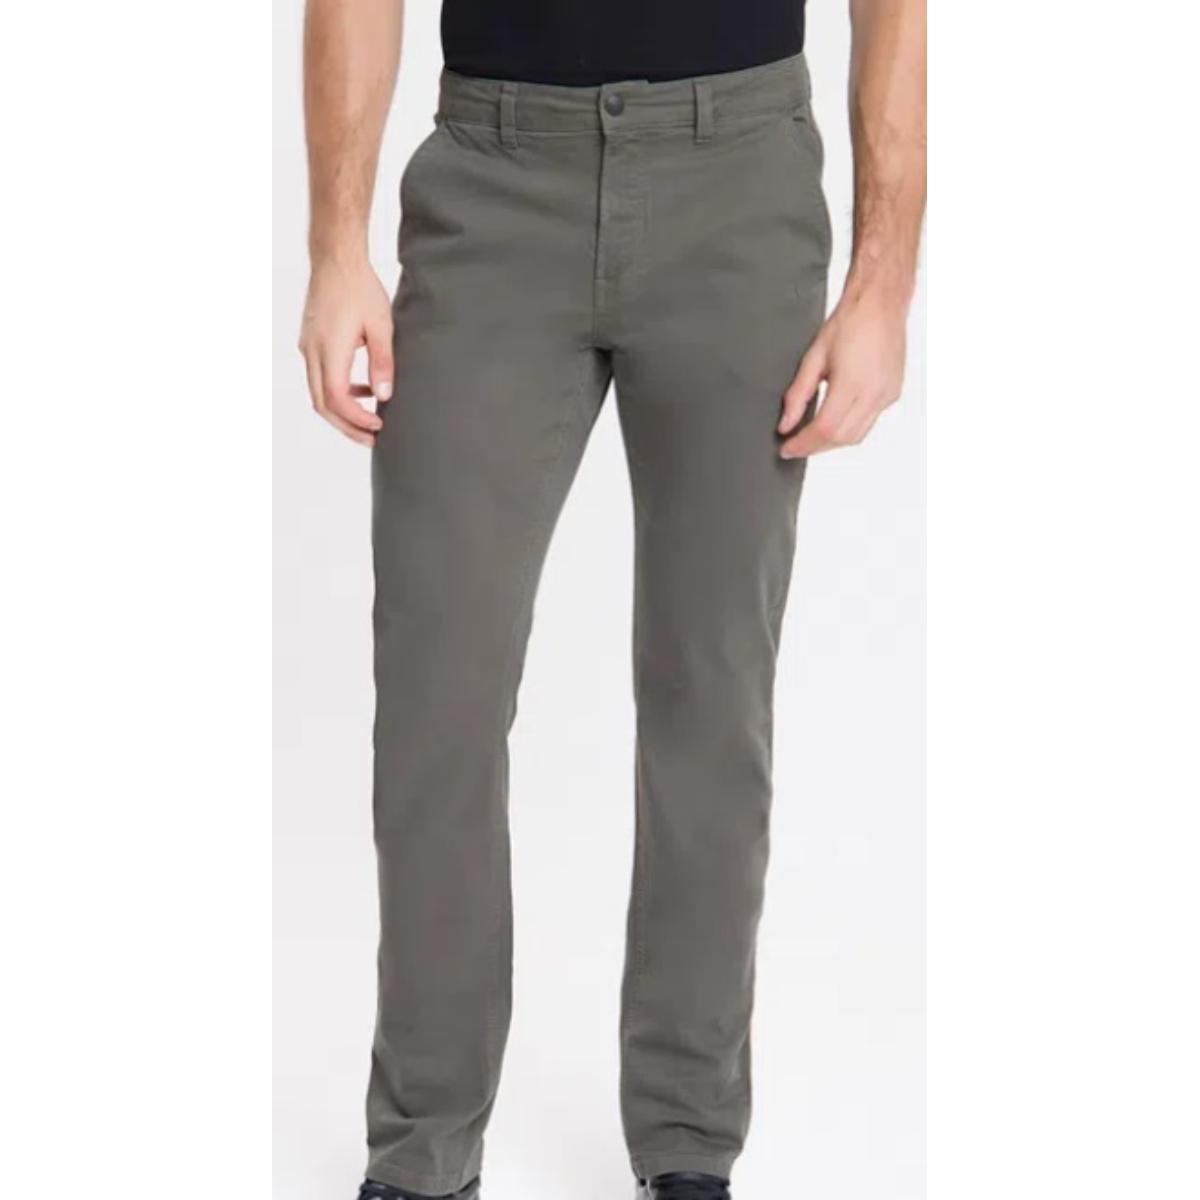 Calça Masculina Calvin Klein Cm0oc10cc141 Chumbo